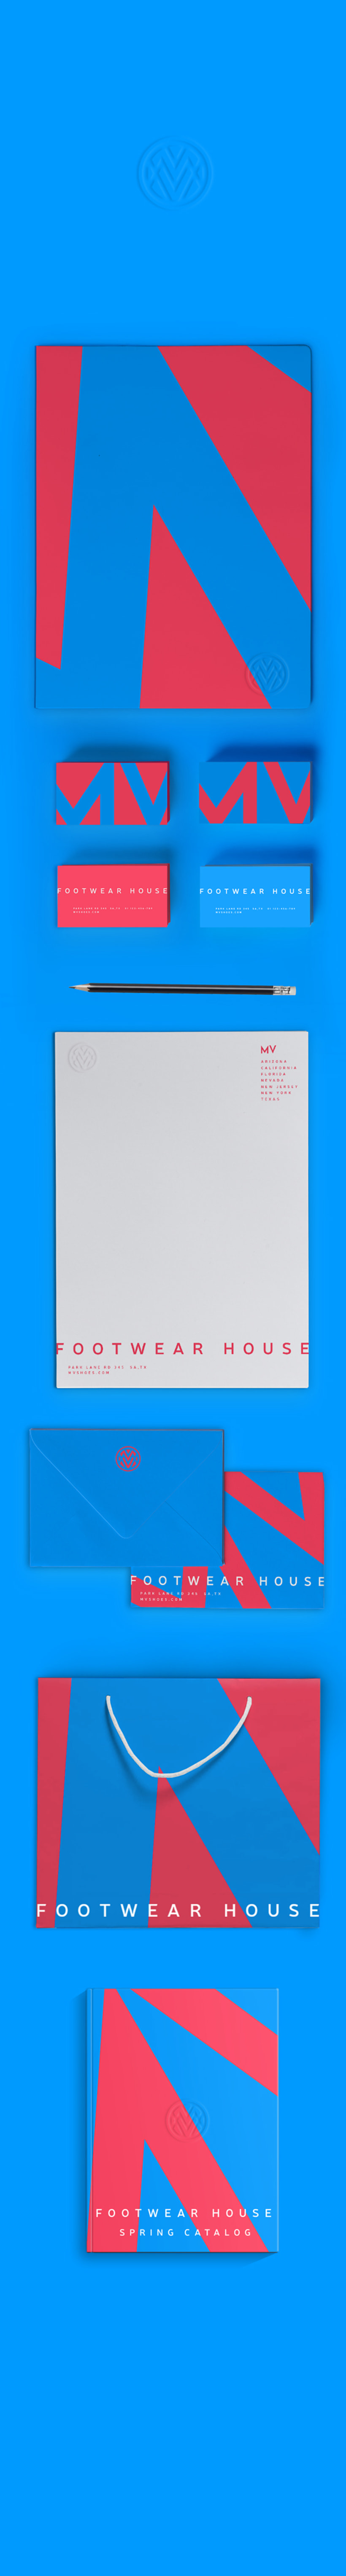 MV Footwarehouse 0